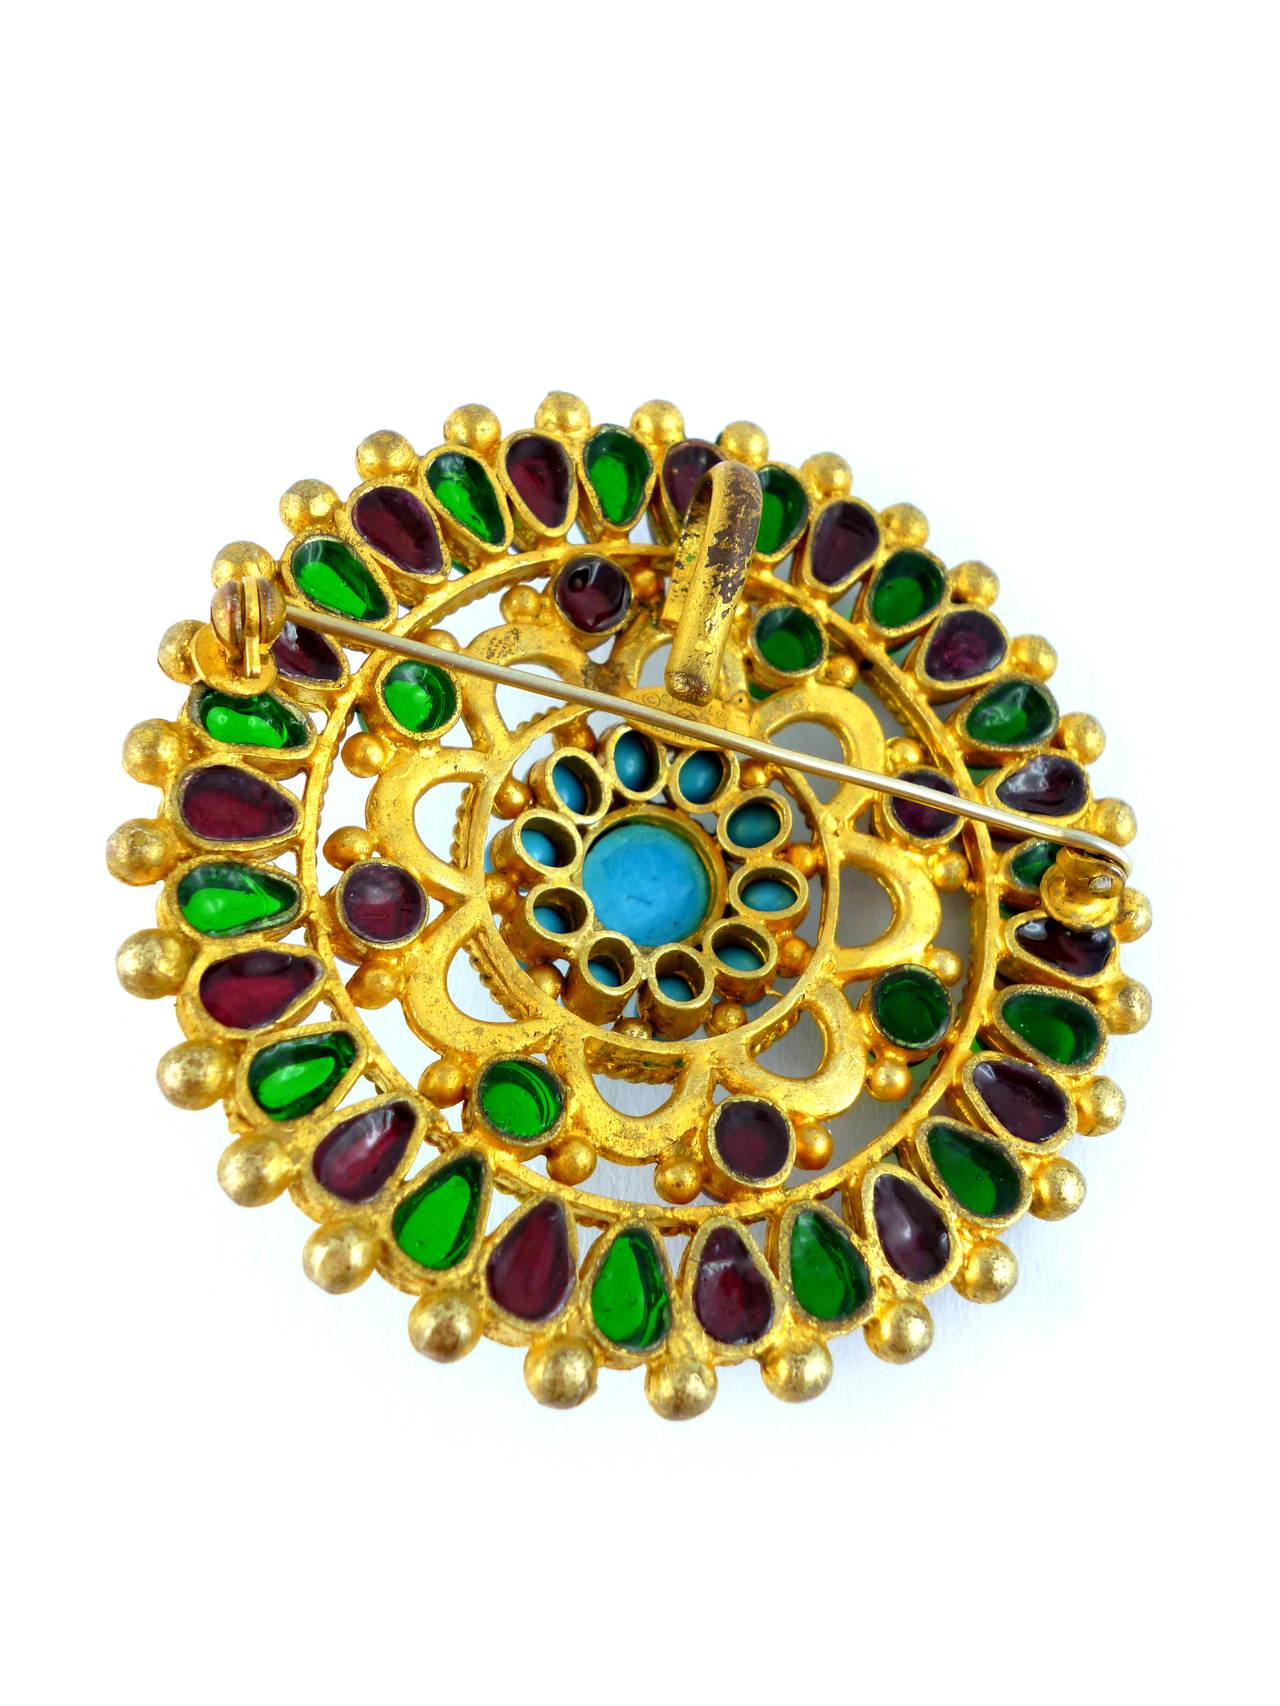 Chanel Massive Gripoix Mughal Brooch Pendant Fall 1993 For Sale 1